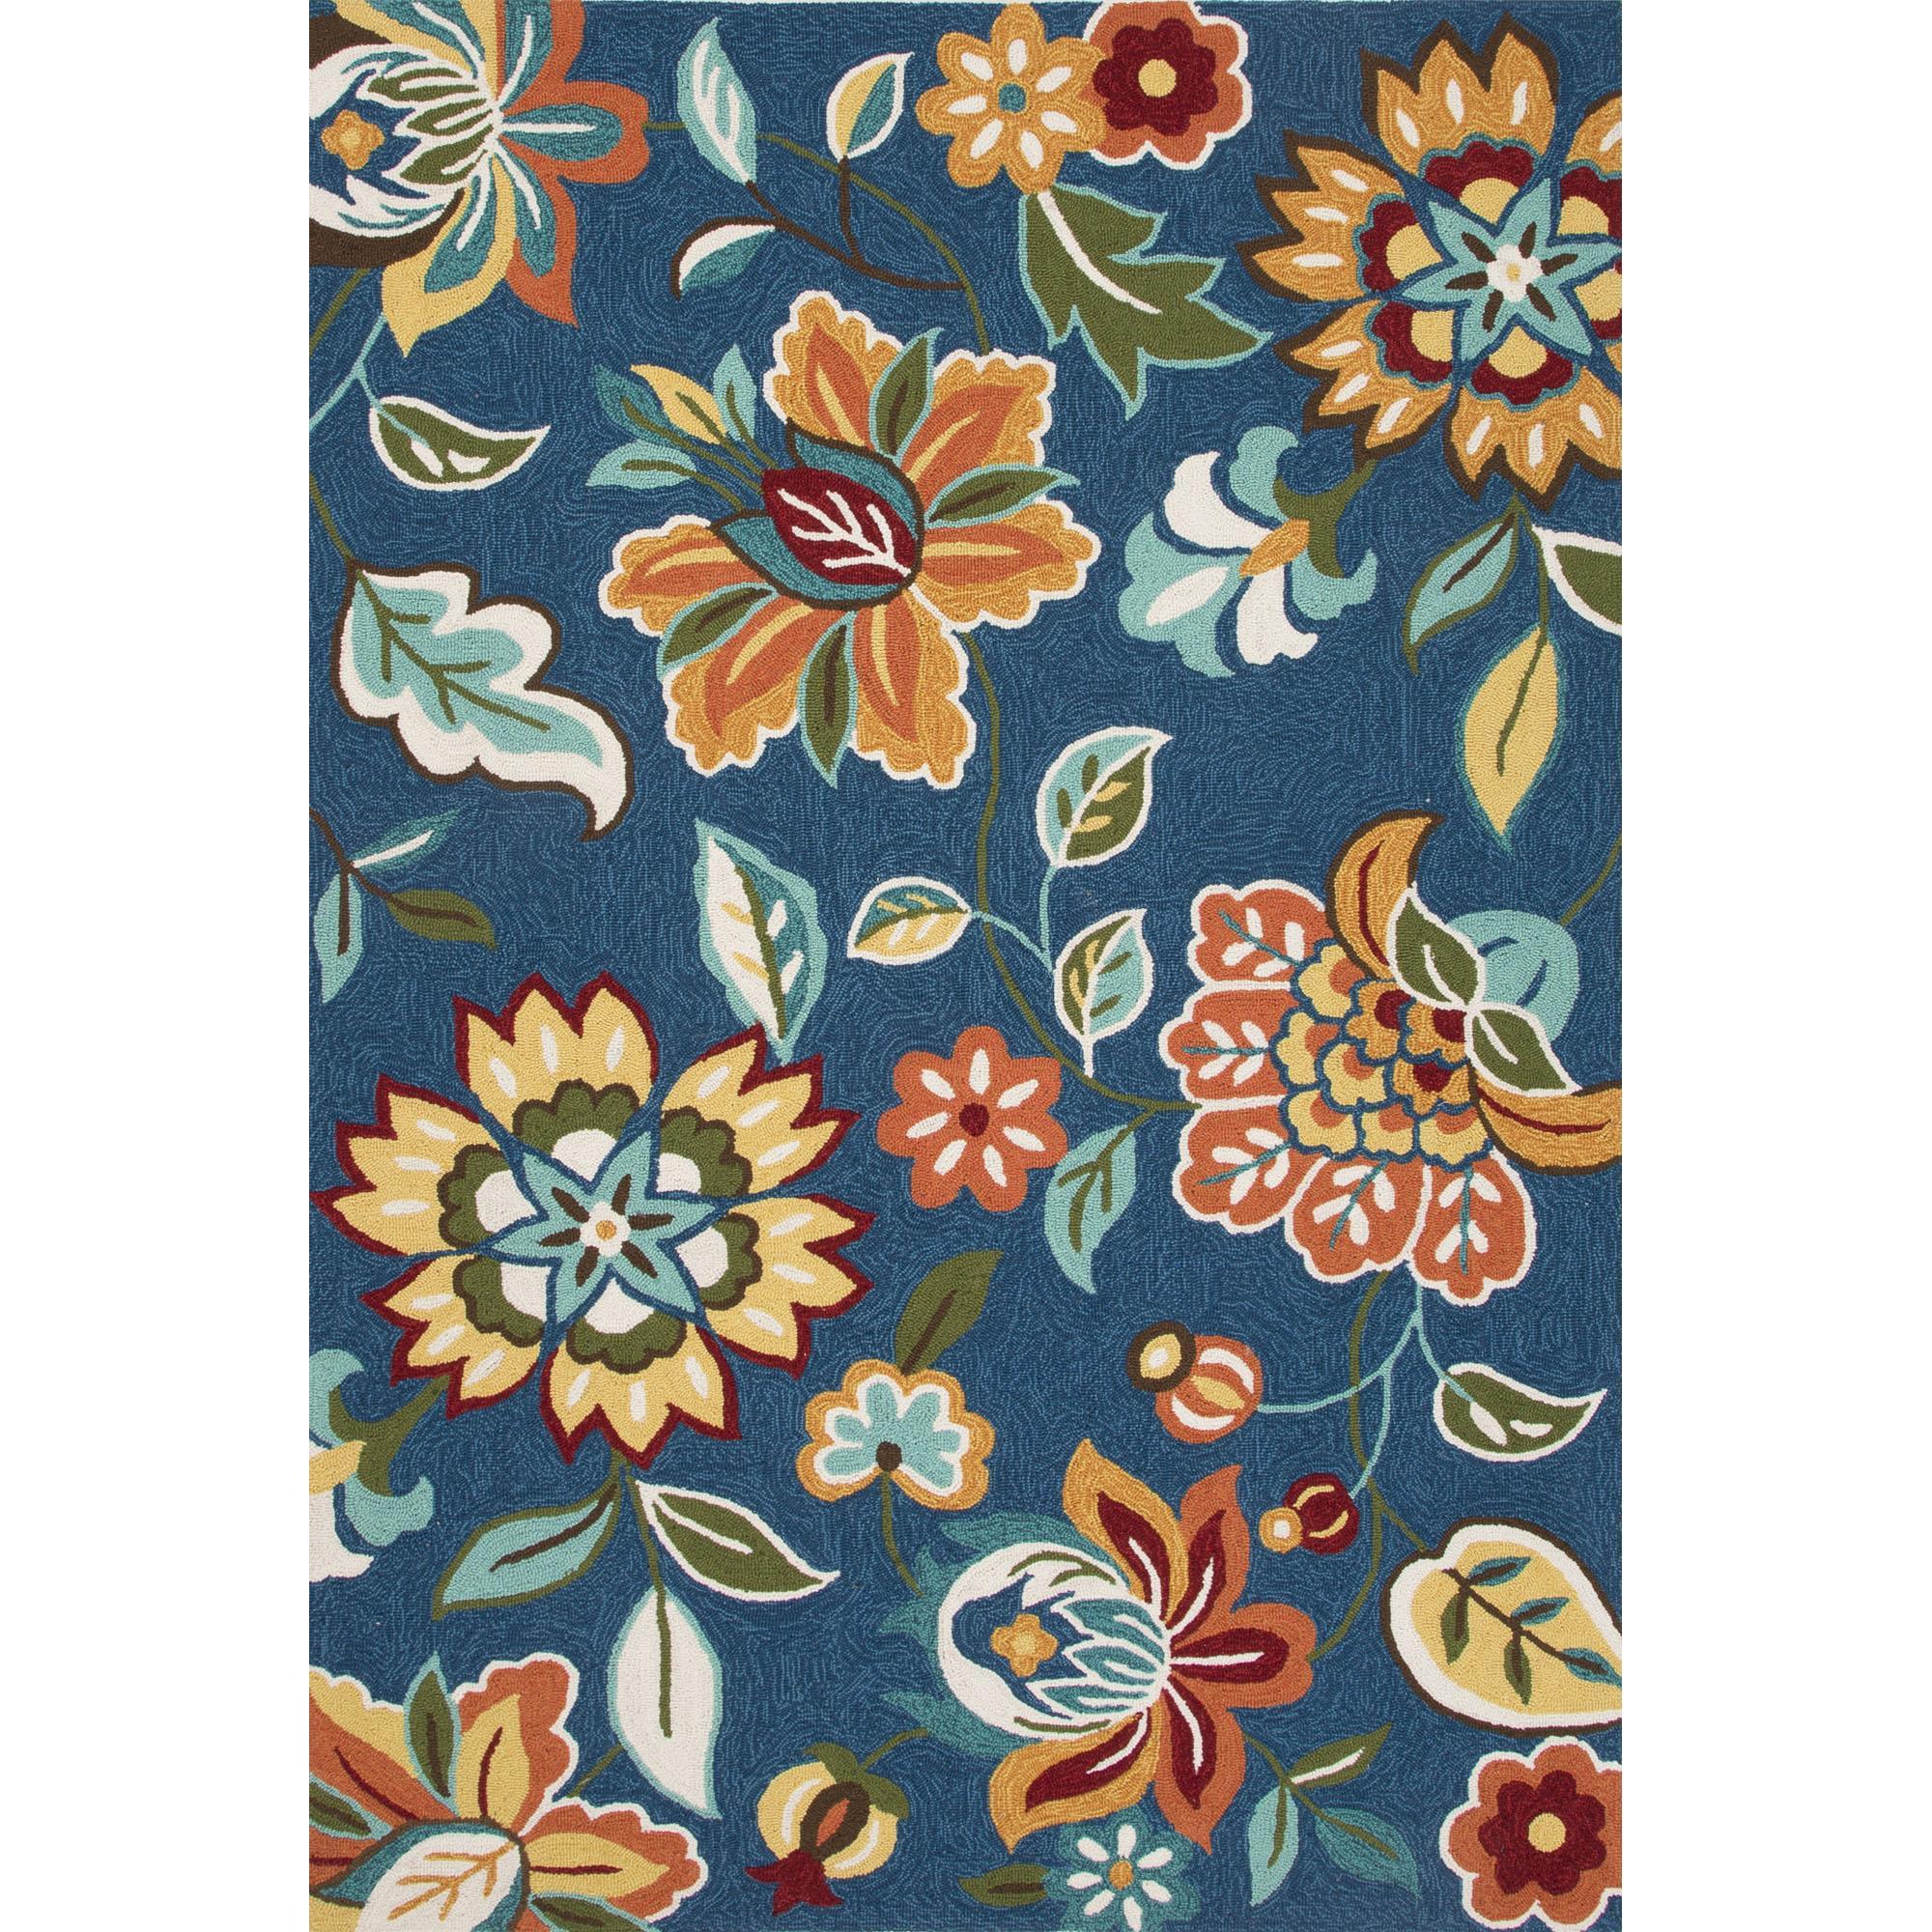 JAIPUR Rugs Blossom 2 x 3 Rug - Item Number: RUG122822